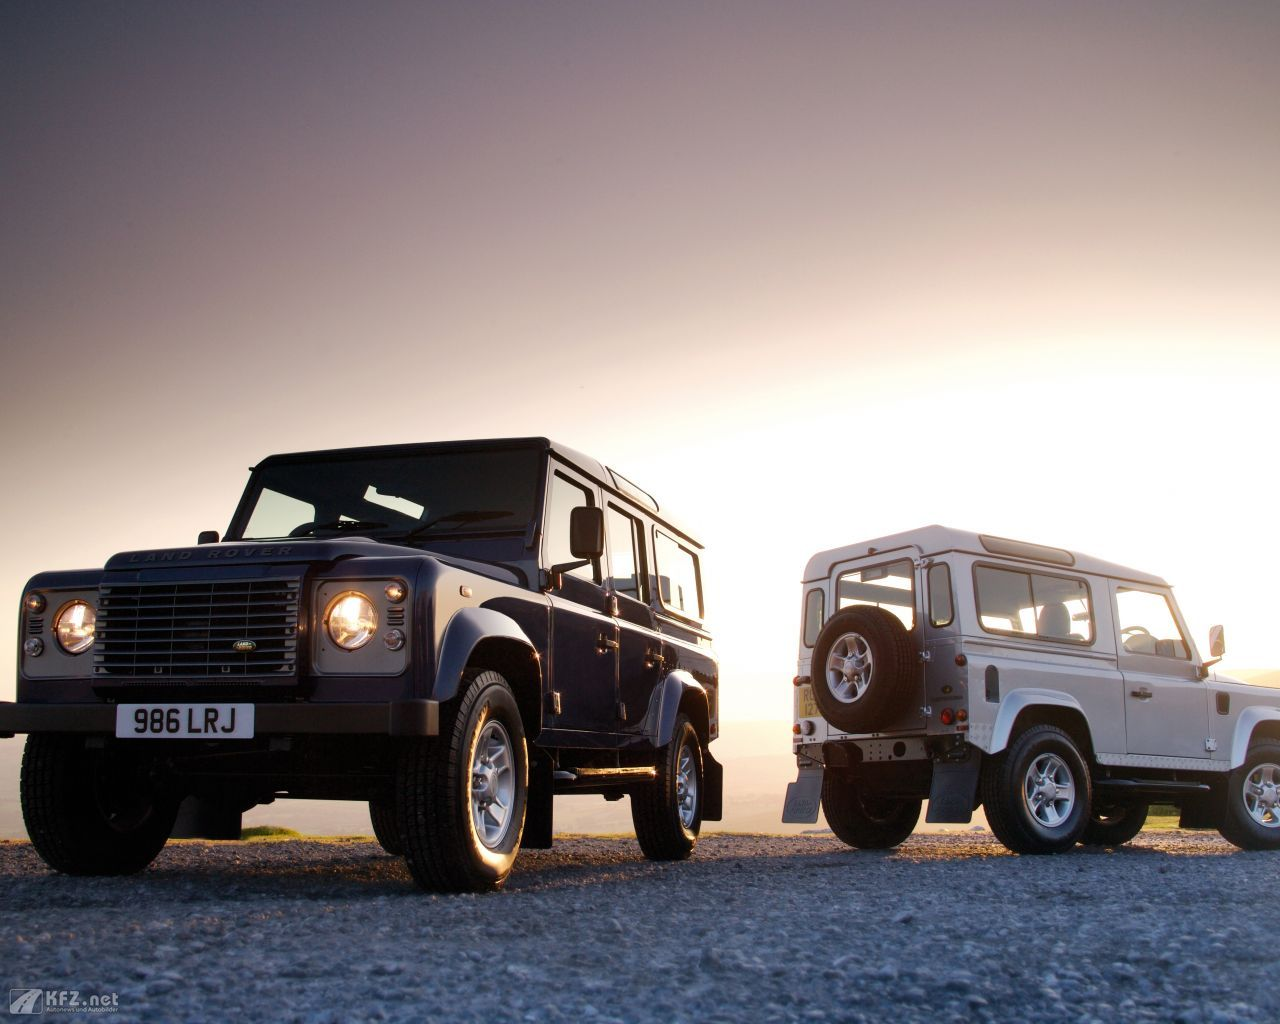 #Landrover #Defender more: http://www.kfz.net/autobilder/land-rover/